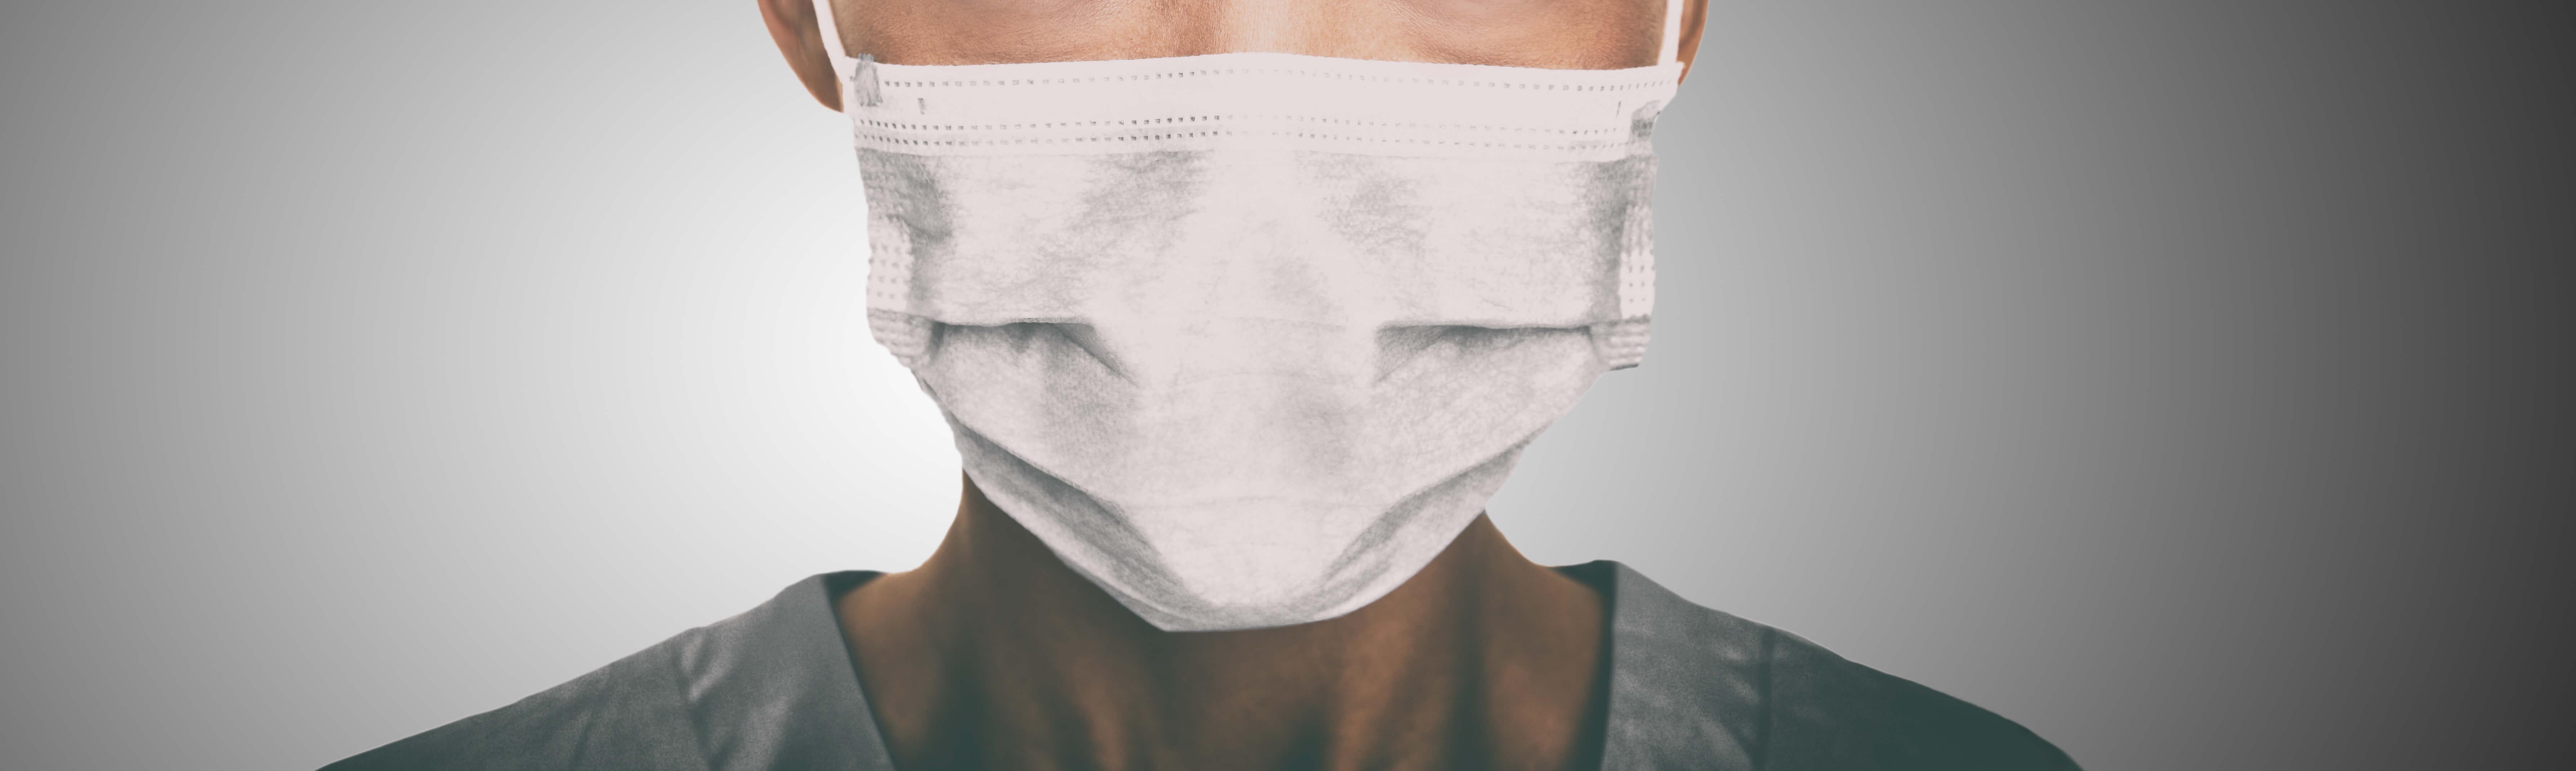 Using STEM practices to understand the current coronavirus crisis